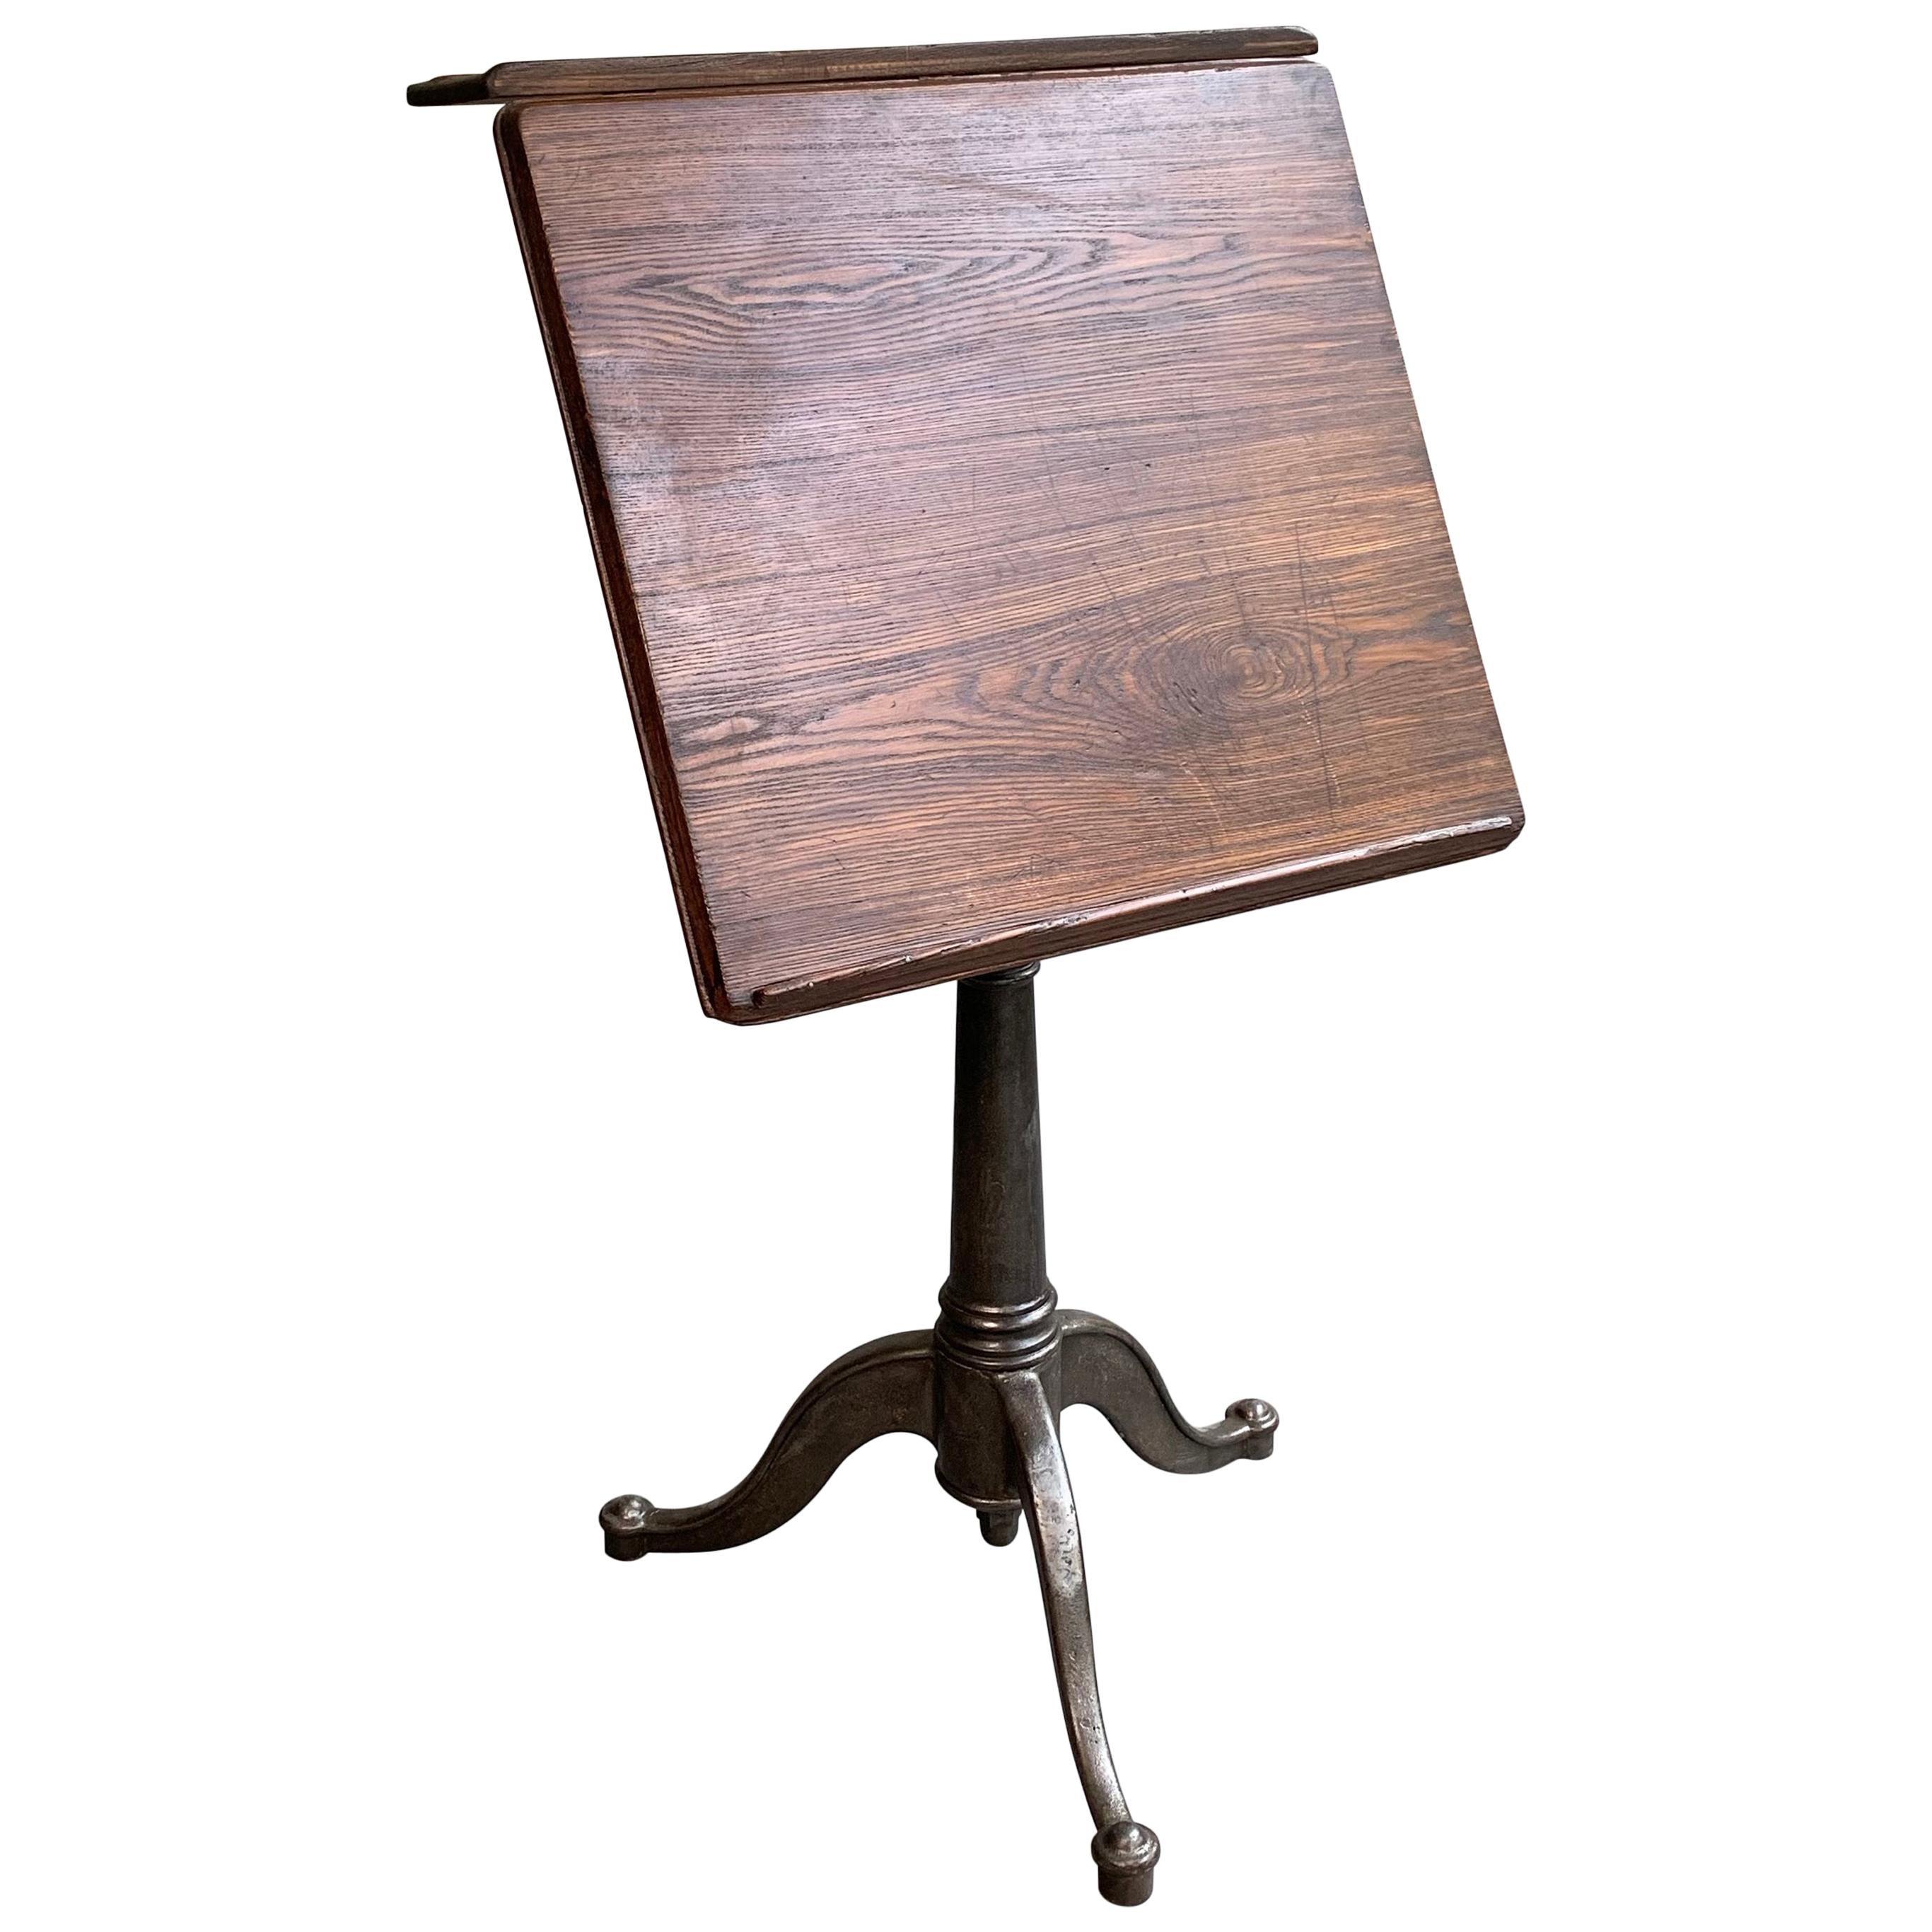 Antique Industrial Oak Artist Rendering Easel with Cast Iron Pedestal Base